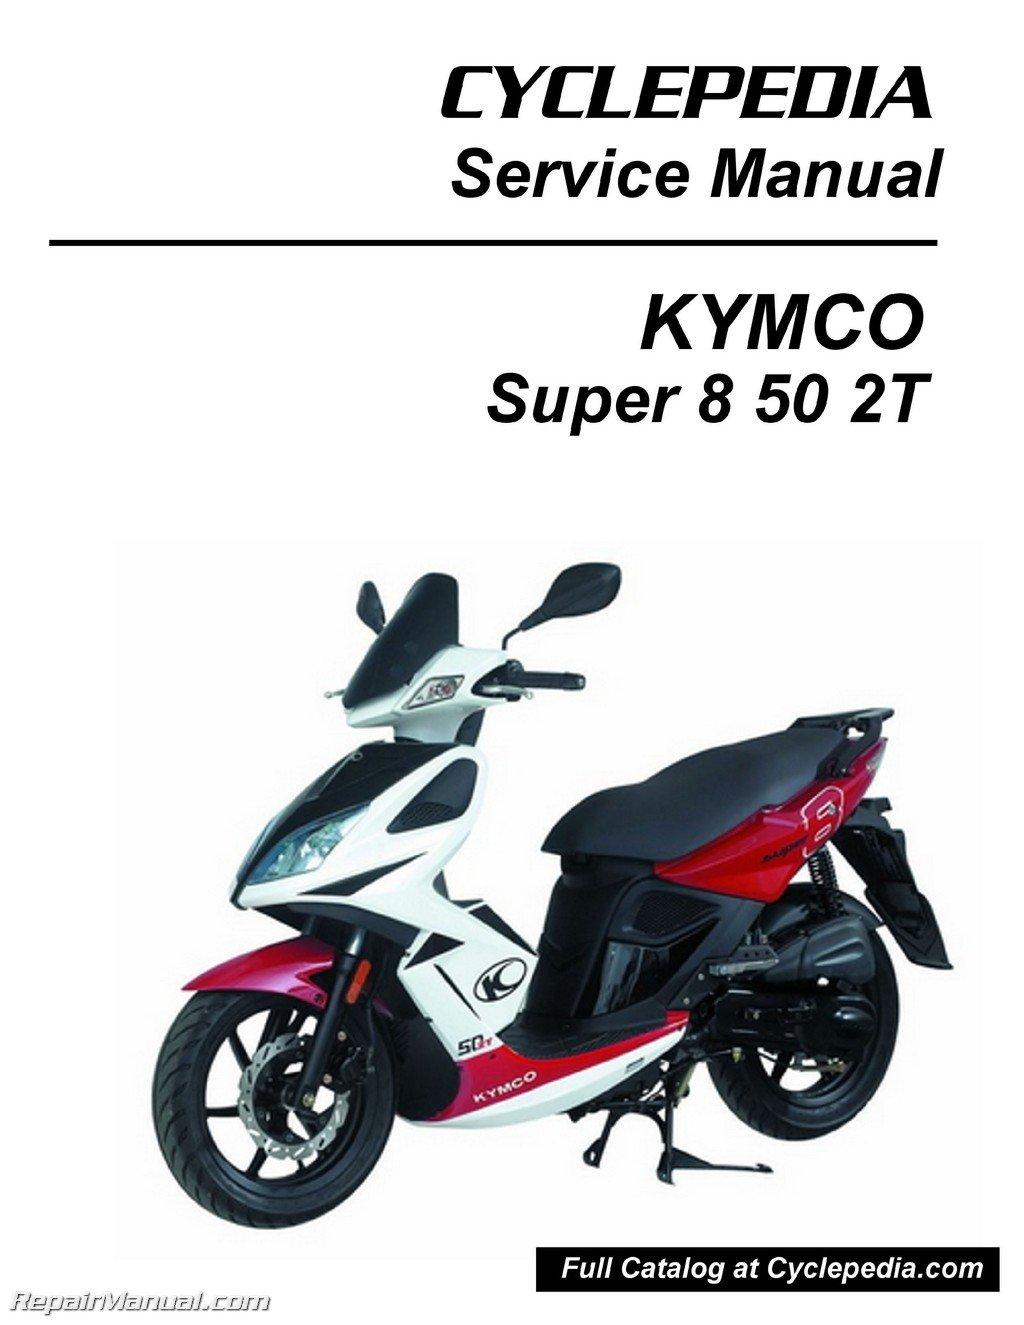 Kymco Super8 50 2t Service Manual